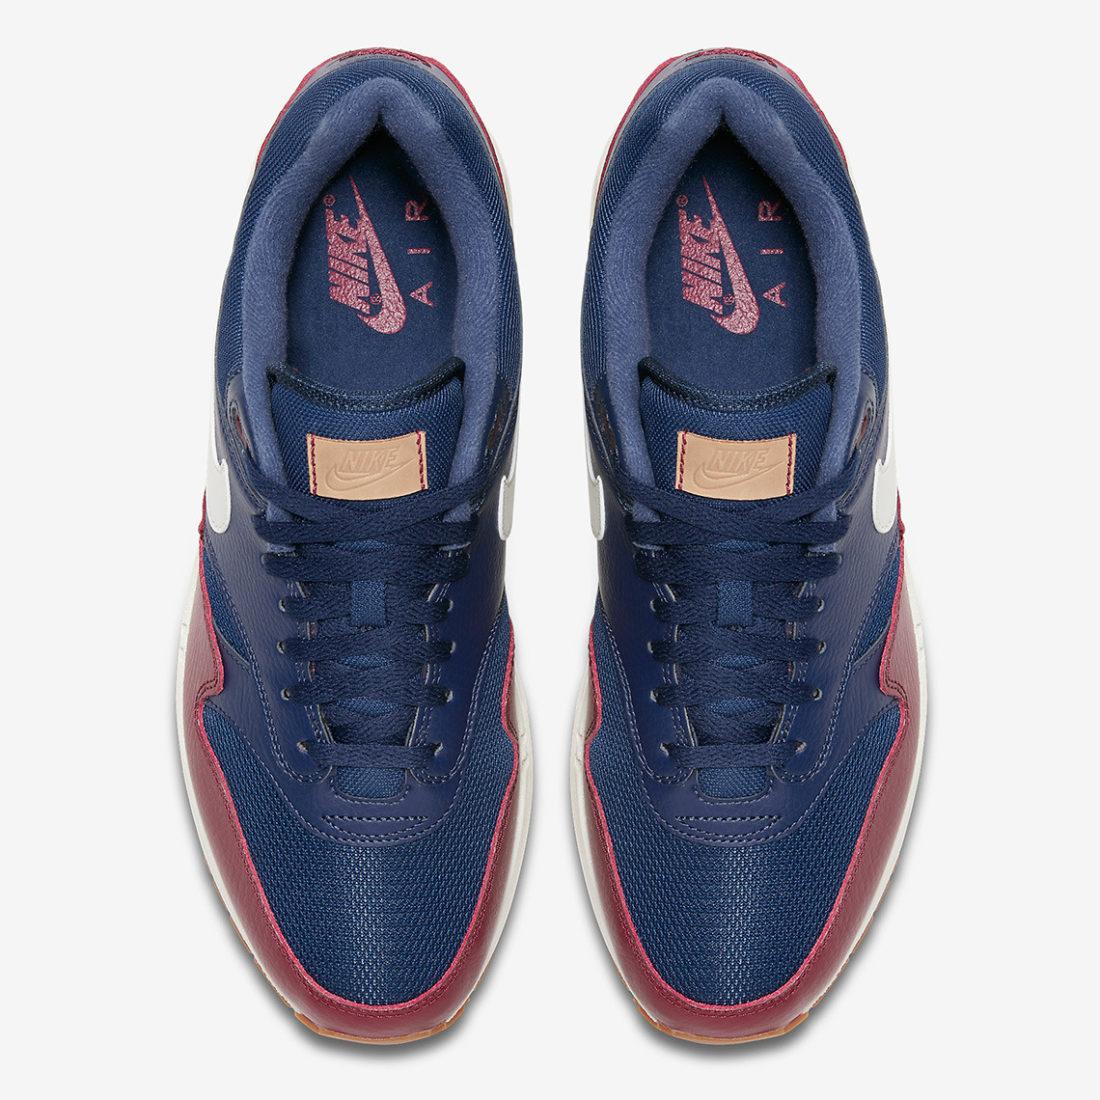 sale retailer 2d7e5 35ce8 nike-air-max-1-AH8145-400-navy-red-